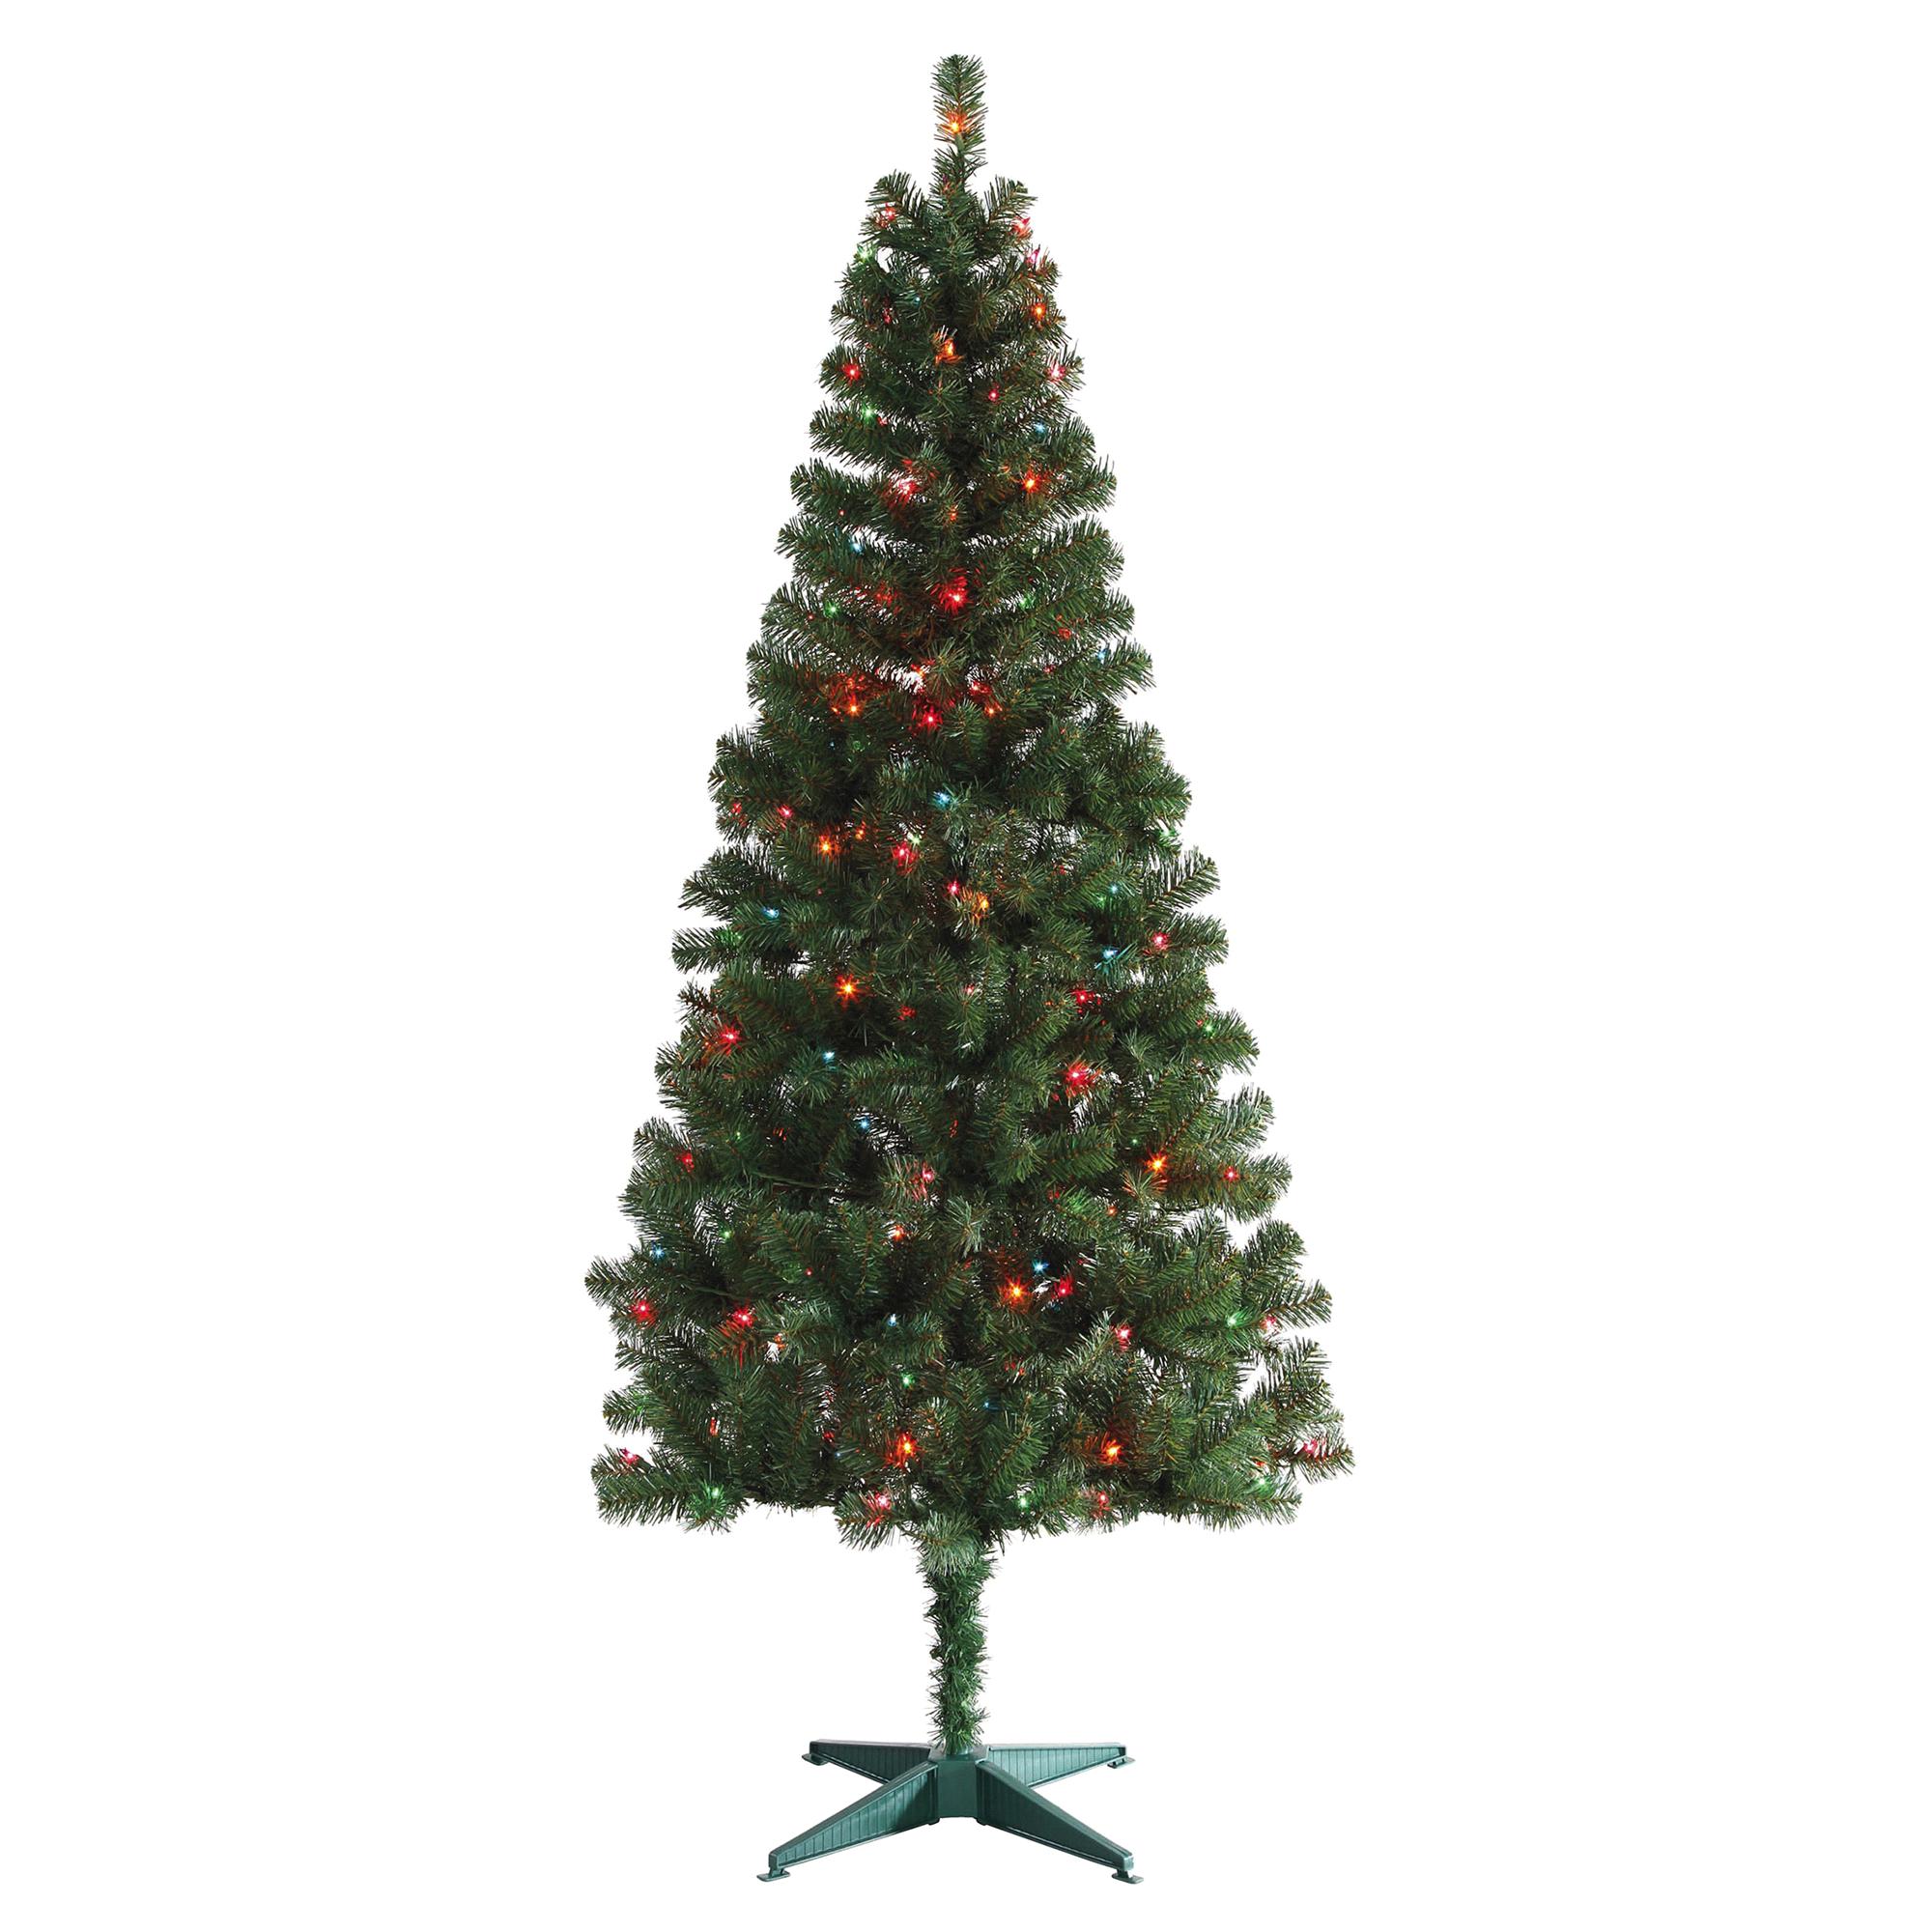 december home 6 tacoma pine pre lit christmas tree multi color lights meijercom - Pine Christmas Tree